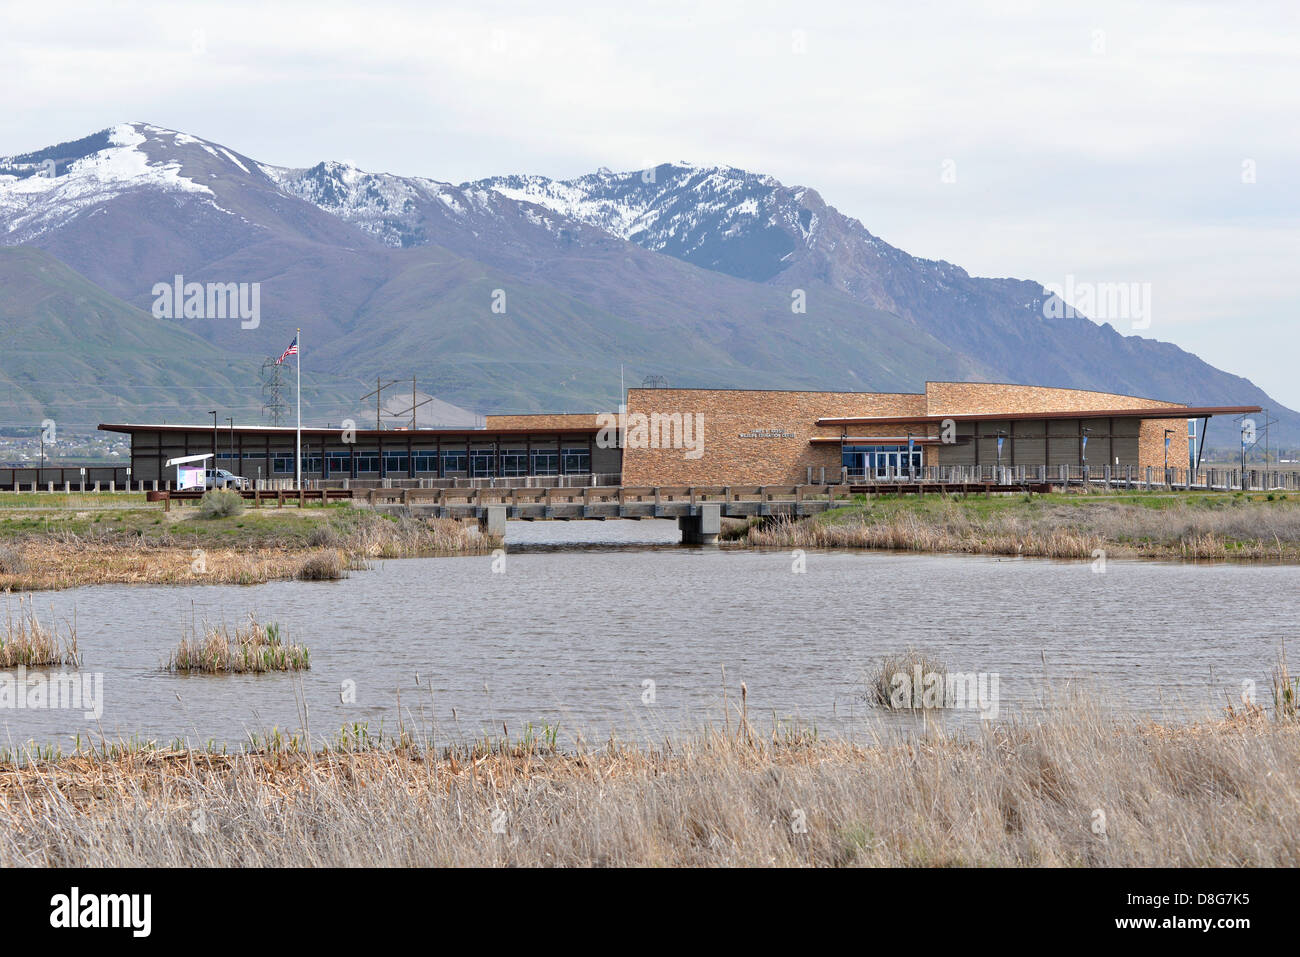 Visitor center of the Bear River Migratory Bird Refuge, Utah. - Stock Image